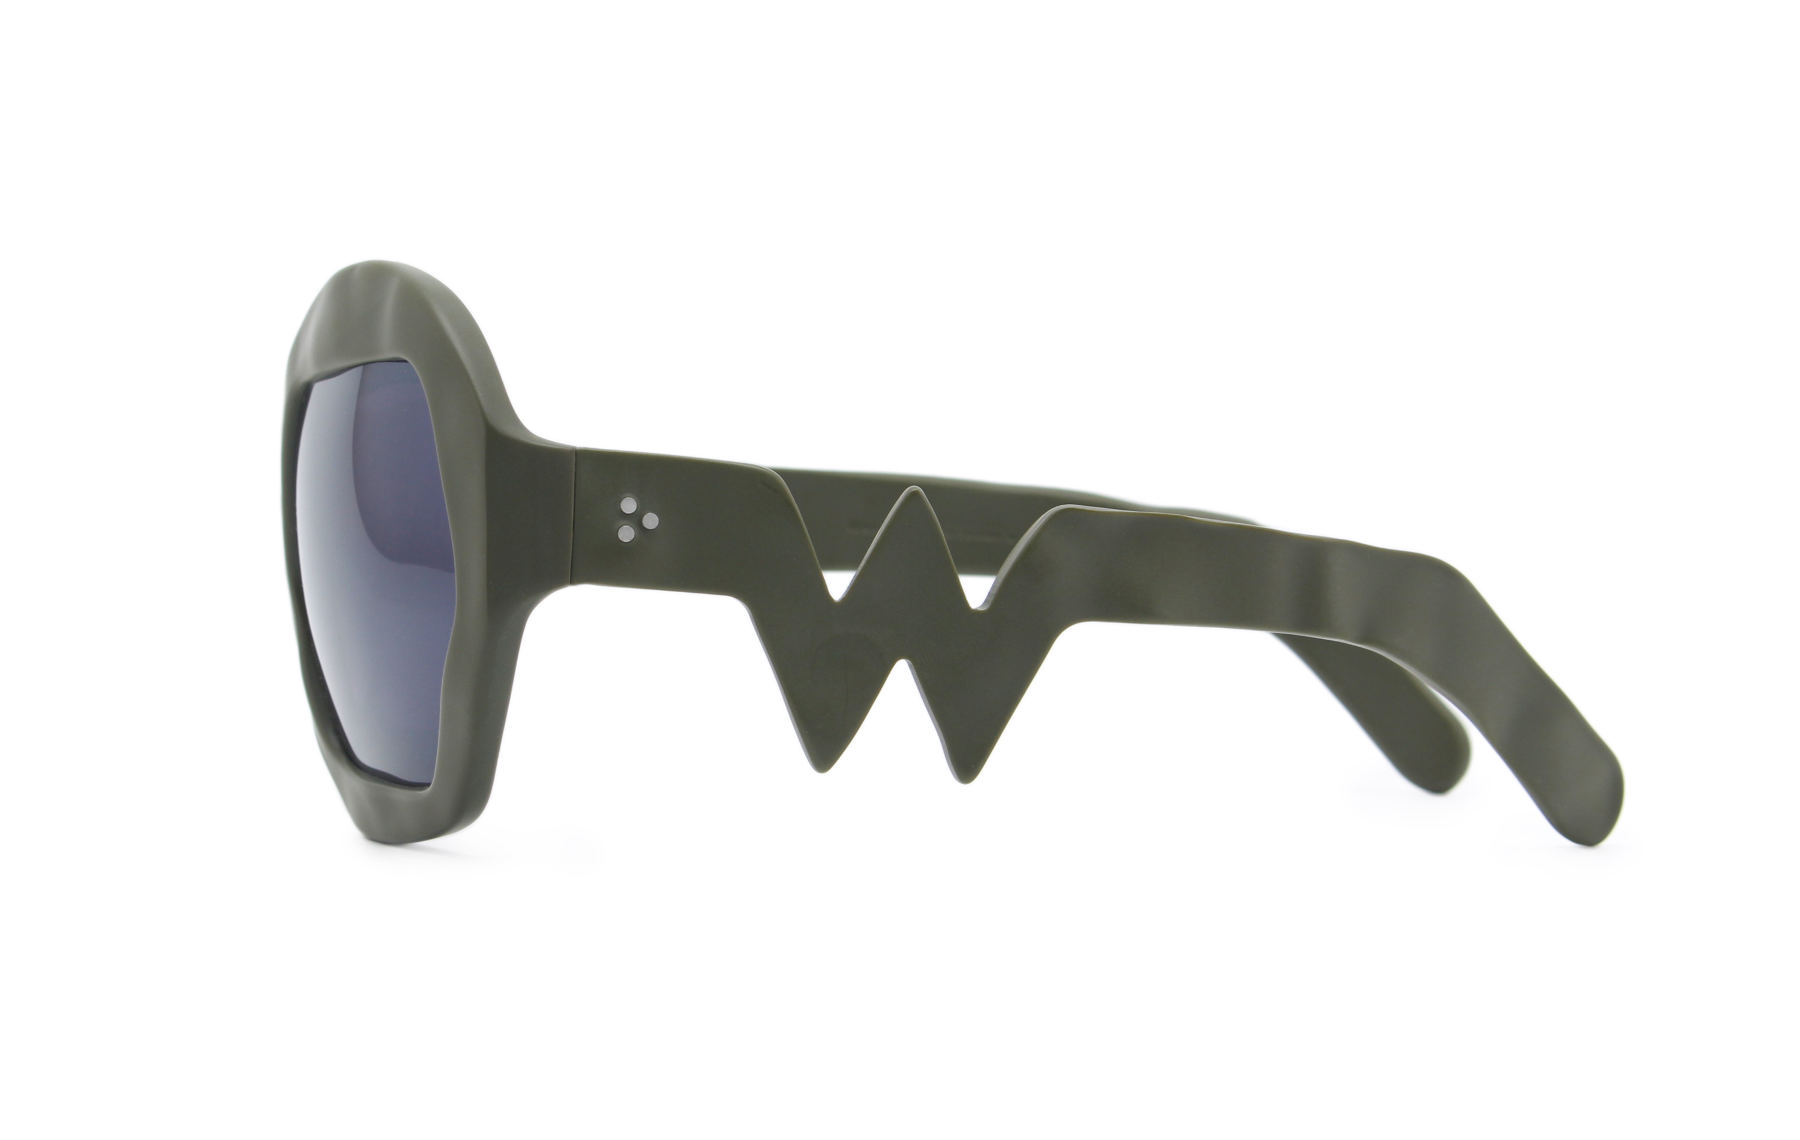 FAKBYFAK x Walter Van Beirendonck  Donder Sunglasses. Military Green Code: FBF-09-14-04